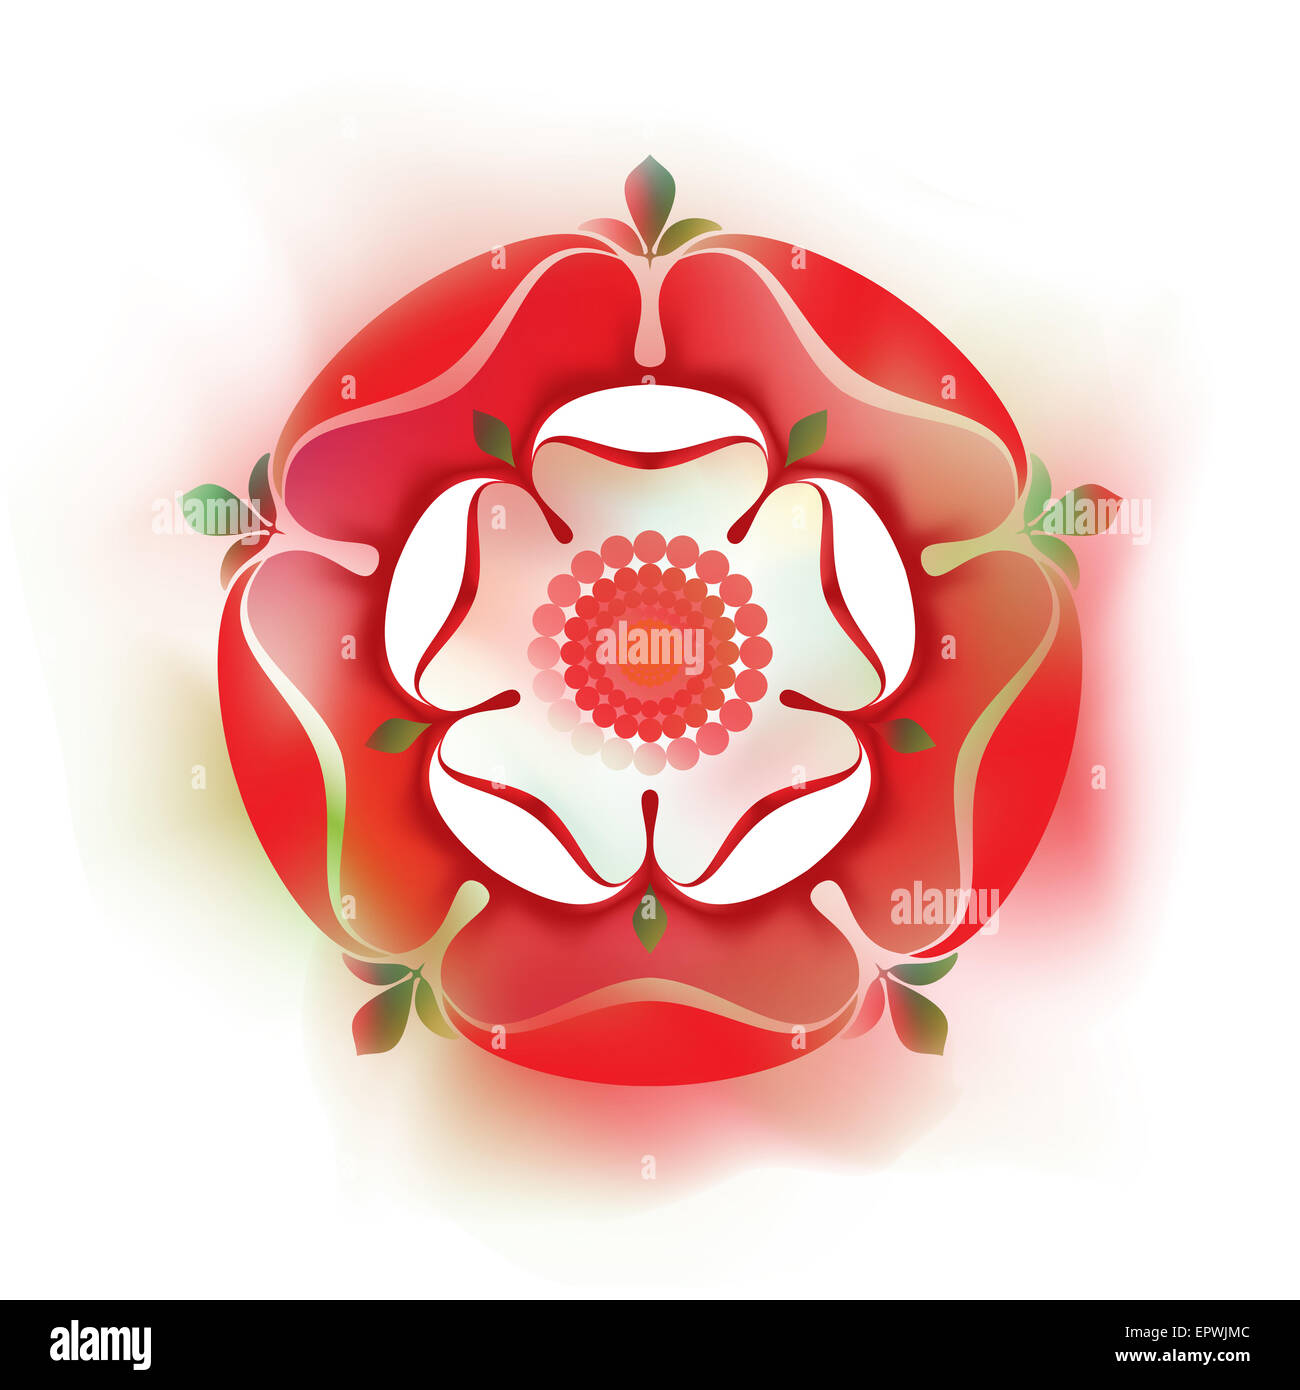 The white rose symbol of the house of york the city of york and tudor dynasty rose shaded illustration english symbol red rose the house of lancaster buycottarizona